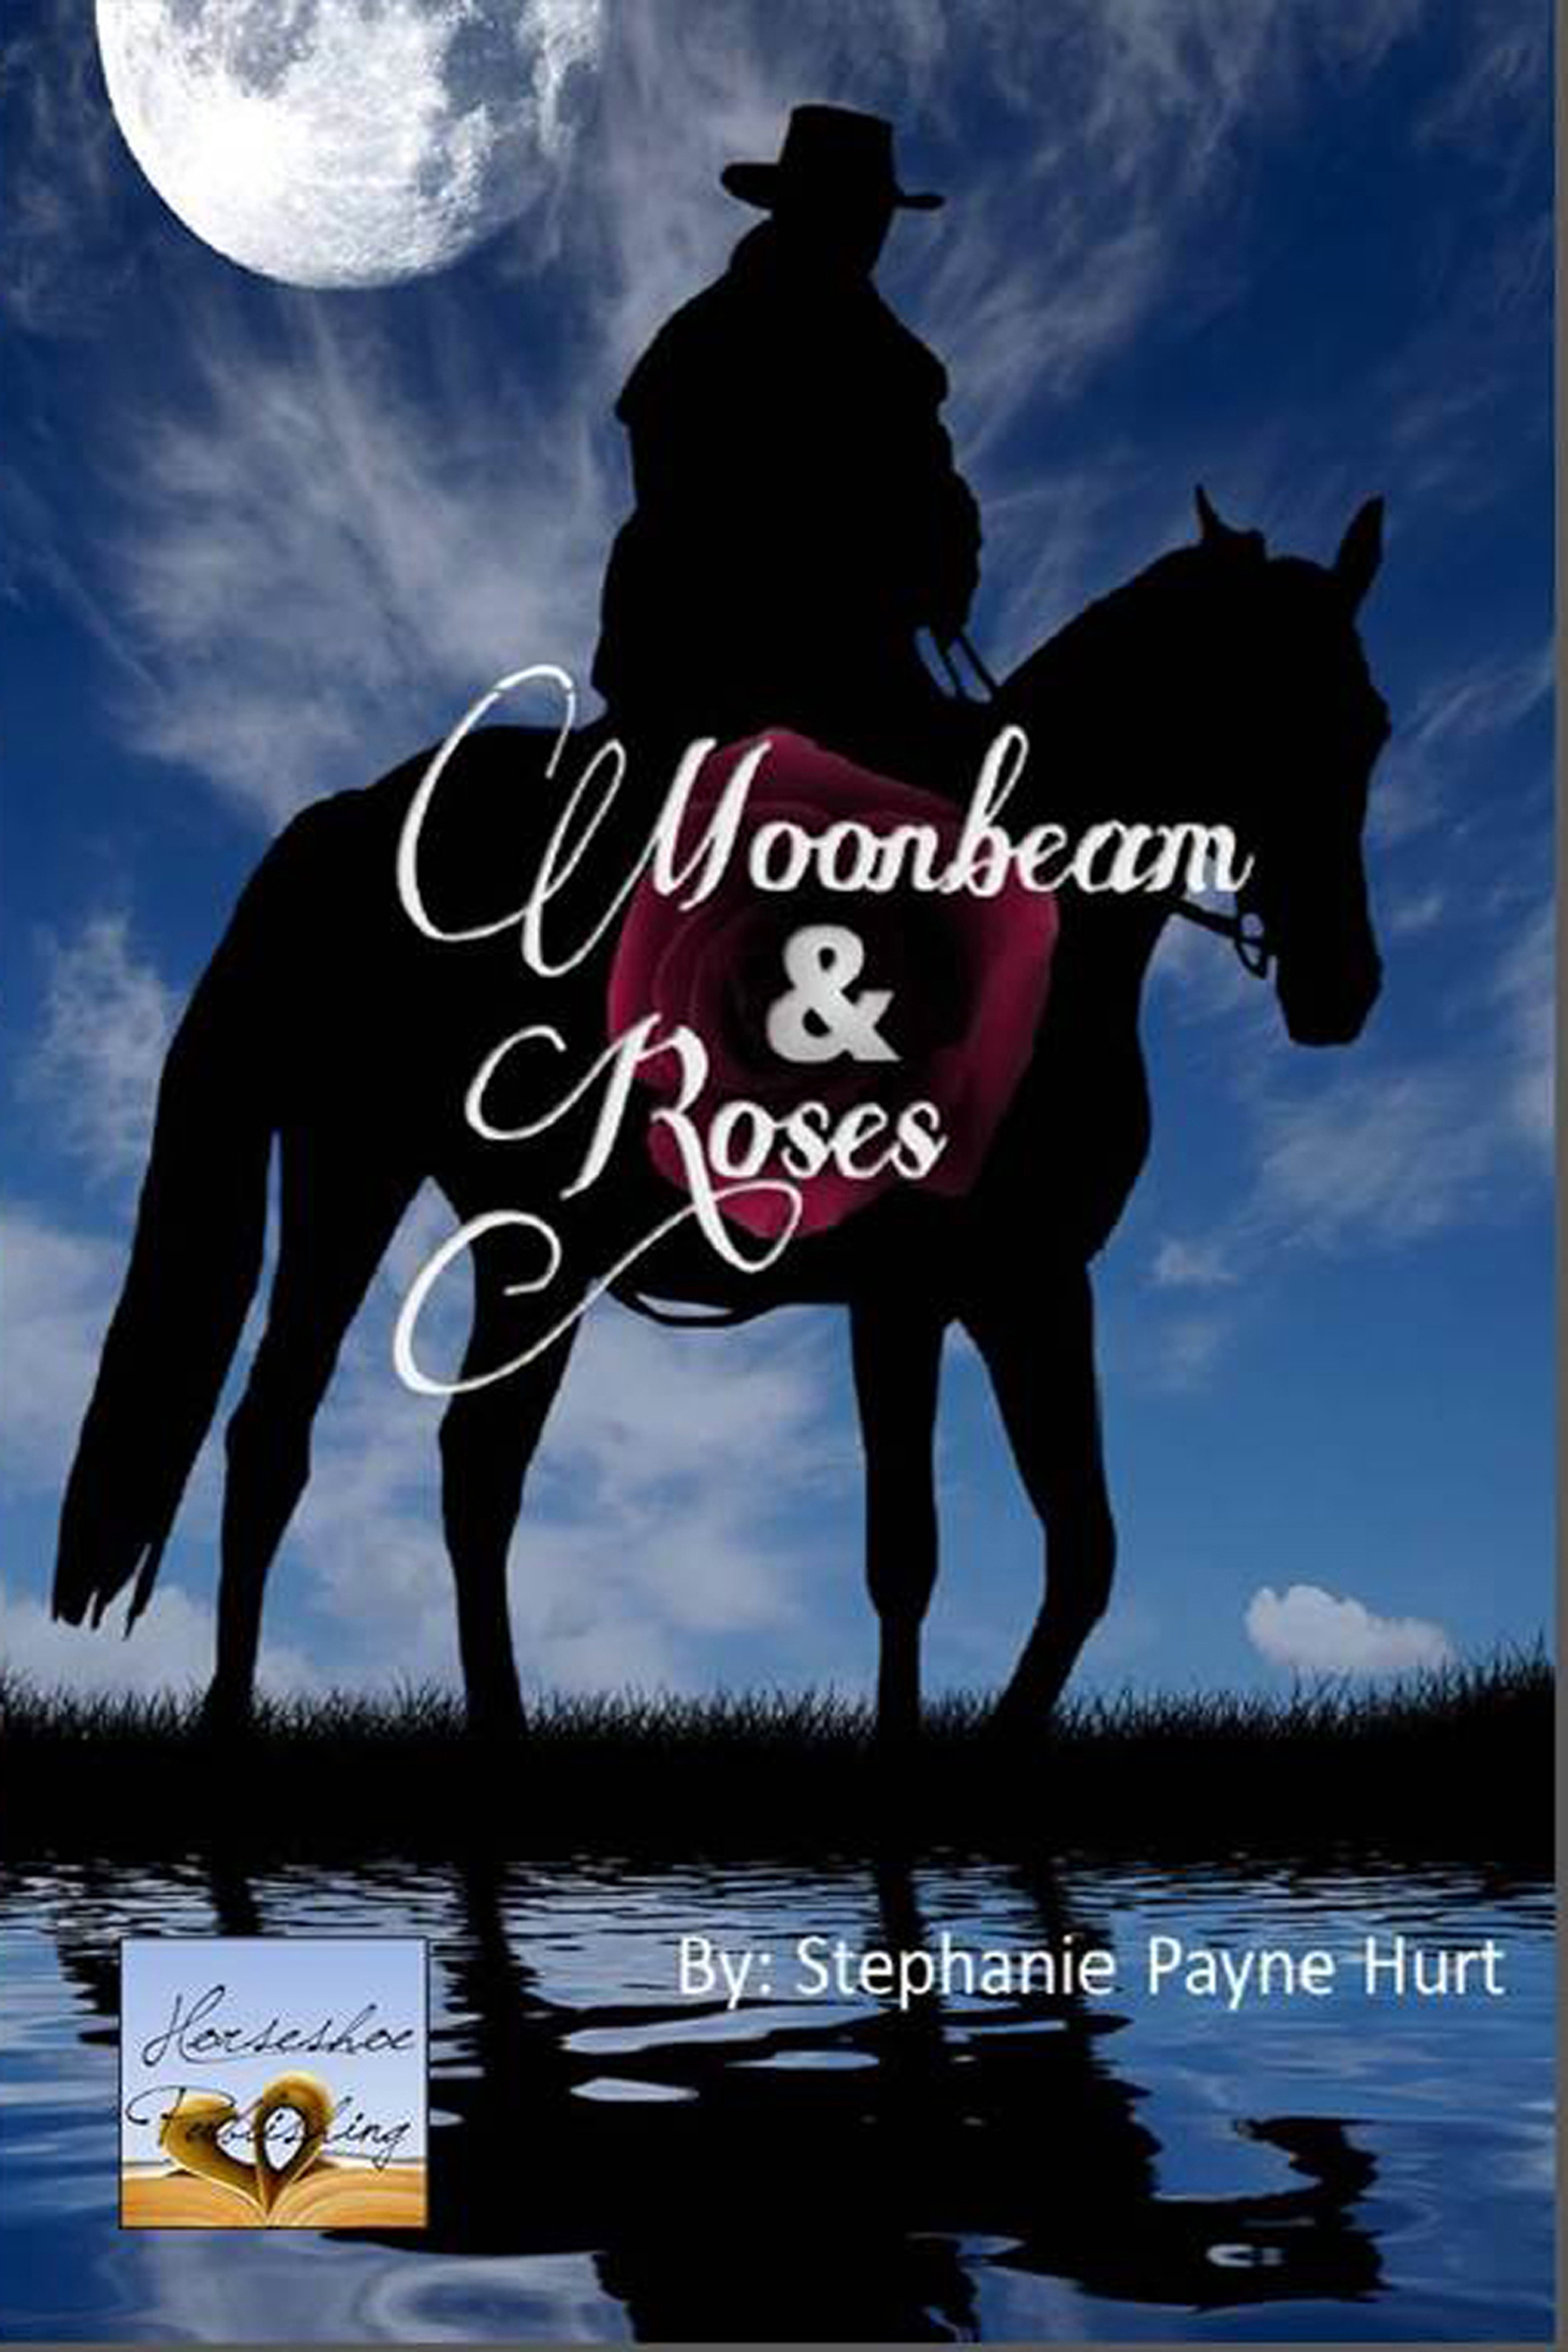 Moonbeam & Roses New Cover